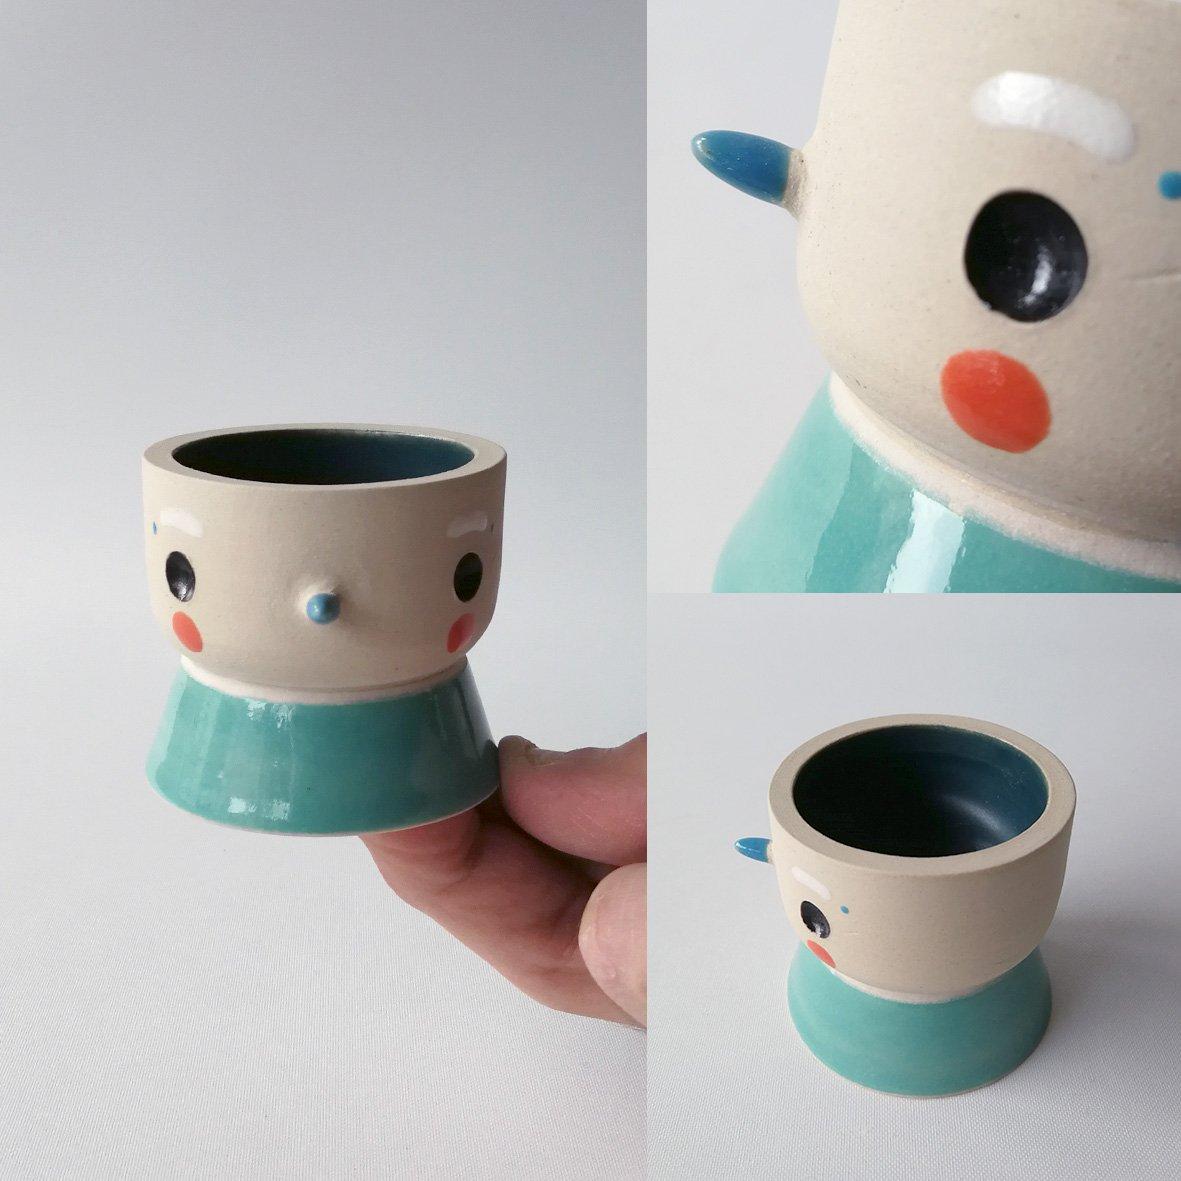 Image of Egg-pote